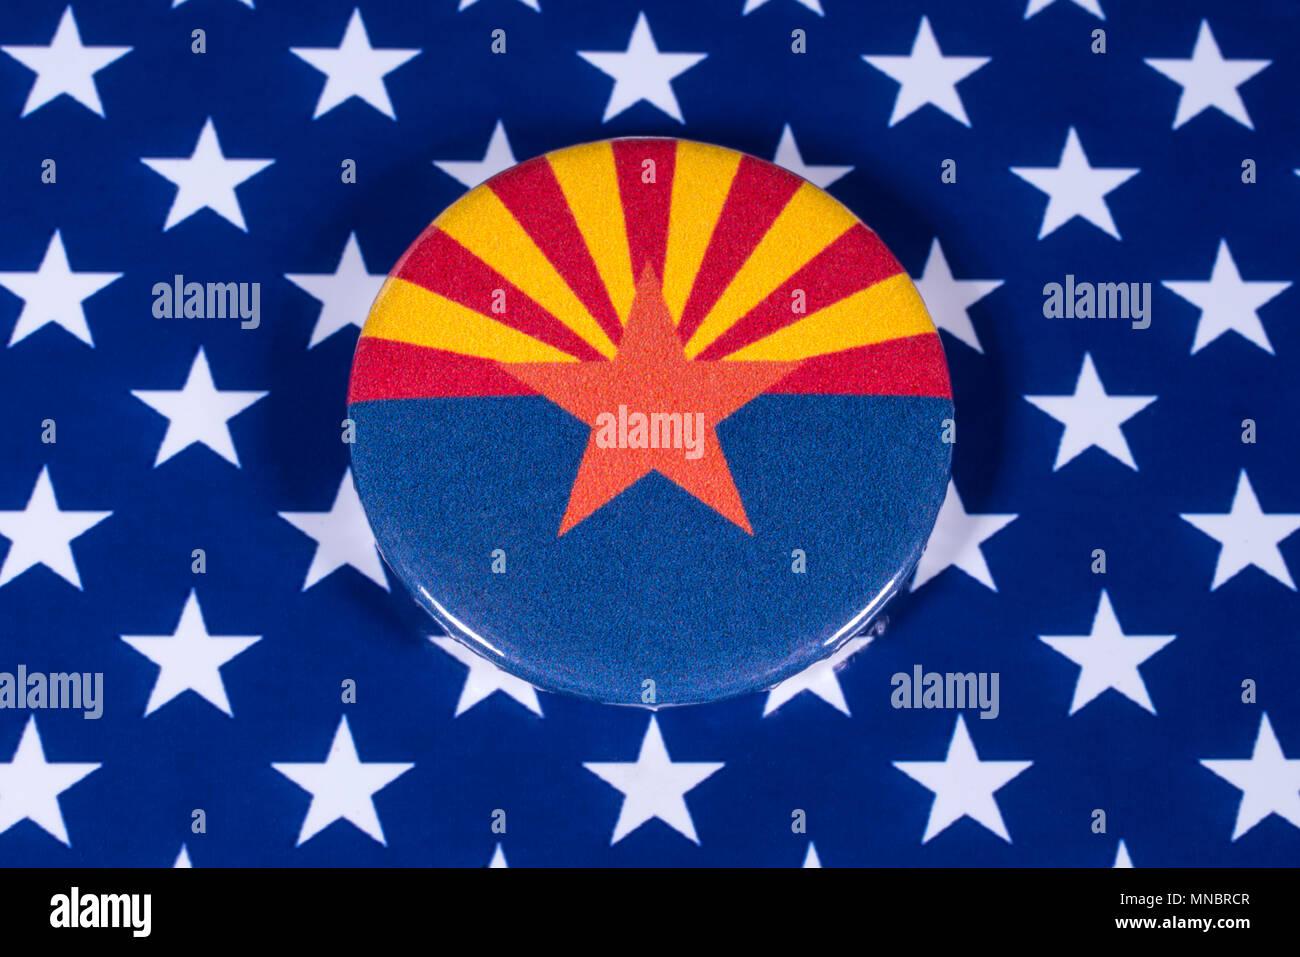 London Uk April 27th 2018 The Symbol Of The State Of Arizona